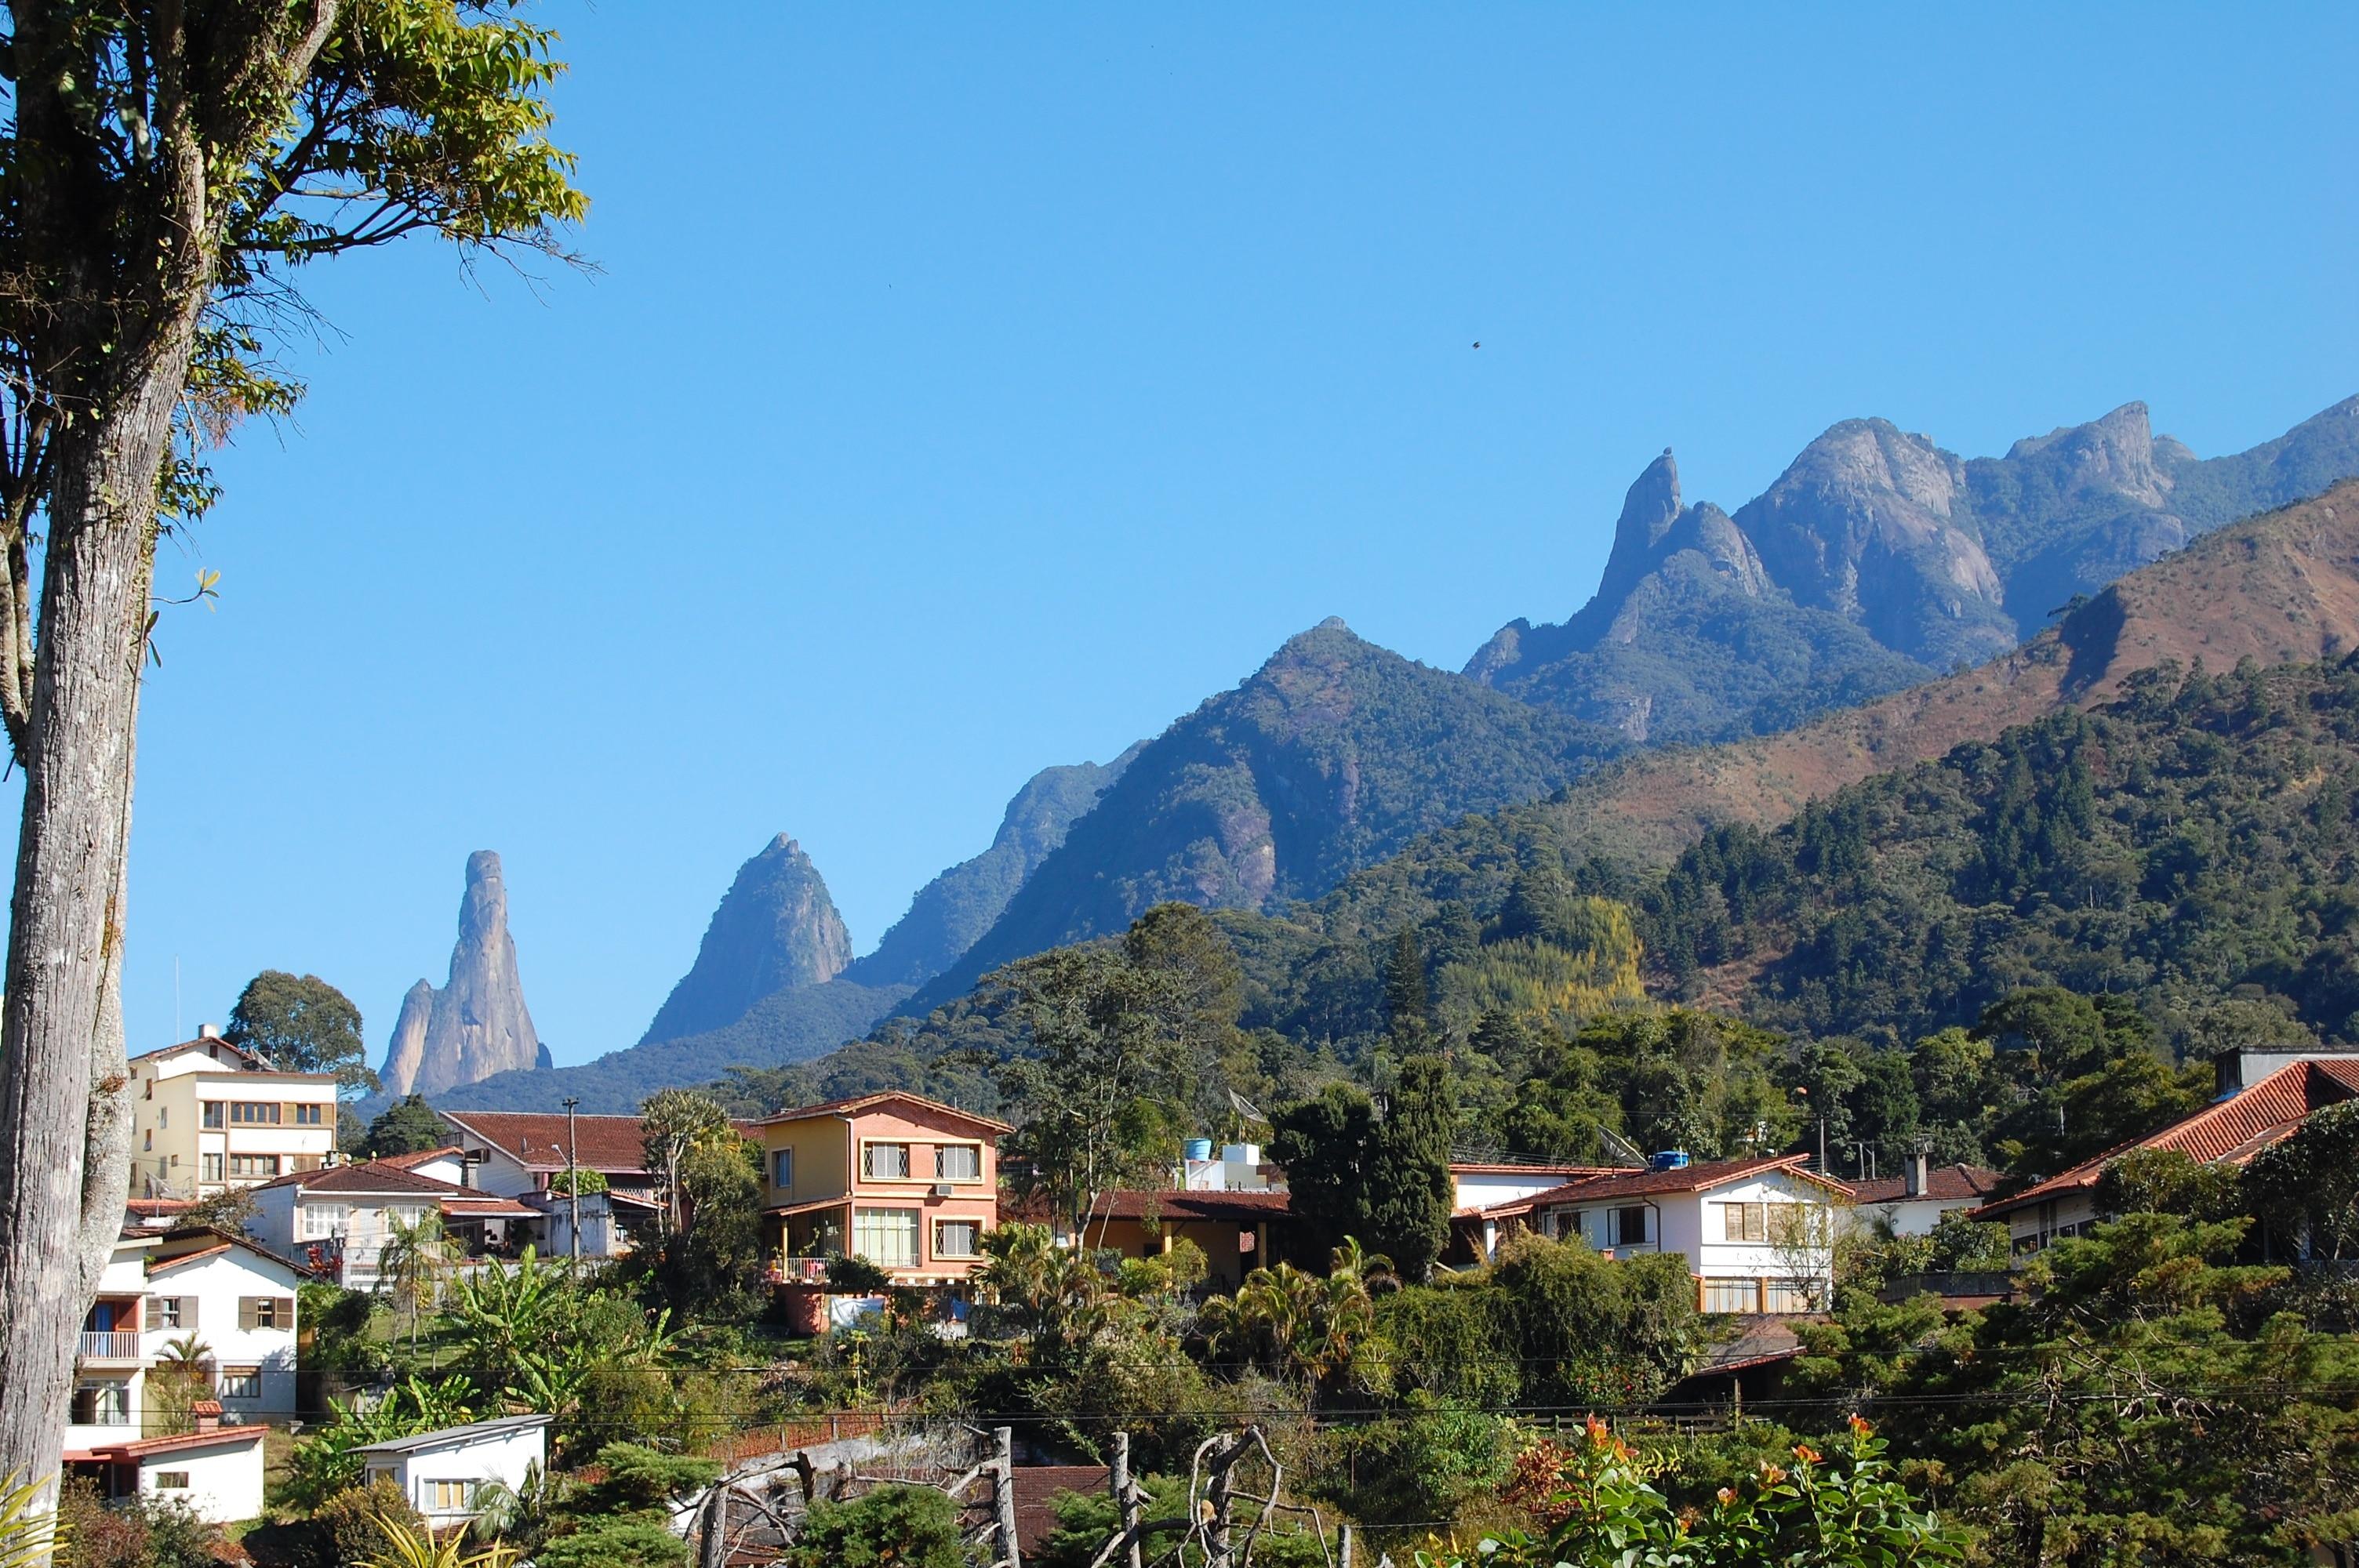 Teresopolis, Rio de Janeiro State, Brazil